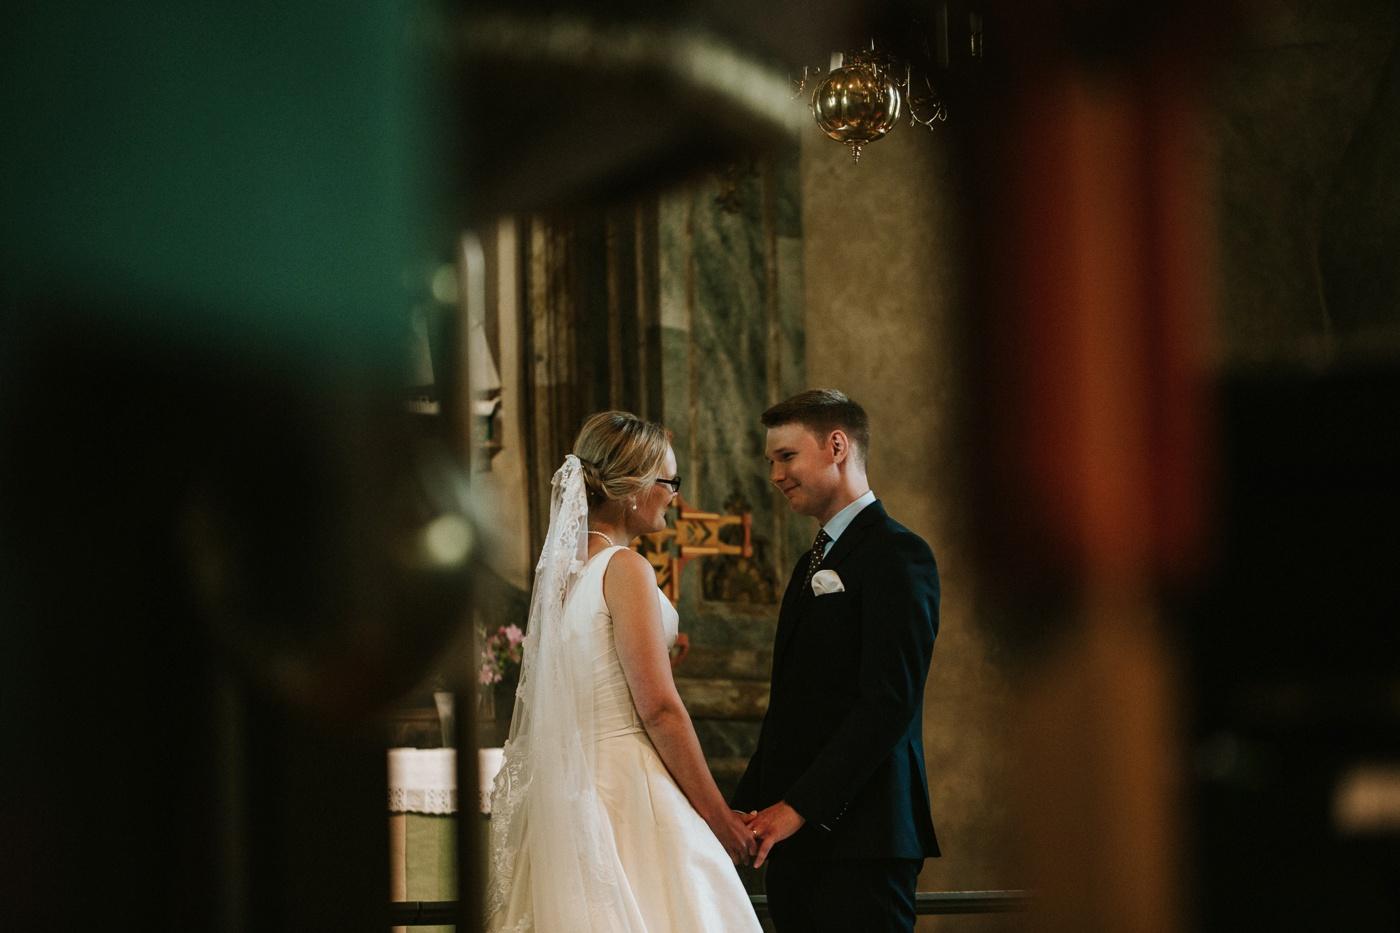 ceciliajoakim_sweden-countryside-summer-wedding_melbourne-fun-quirky-wedding-photography_15